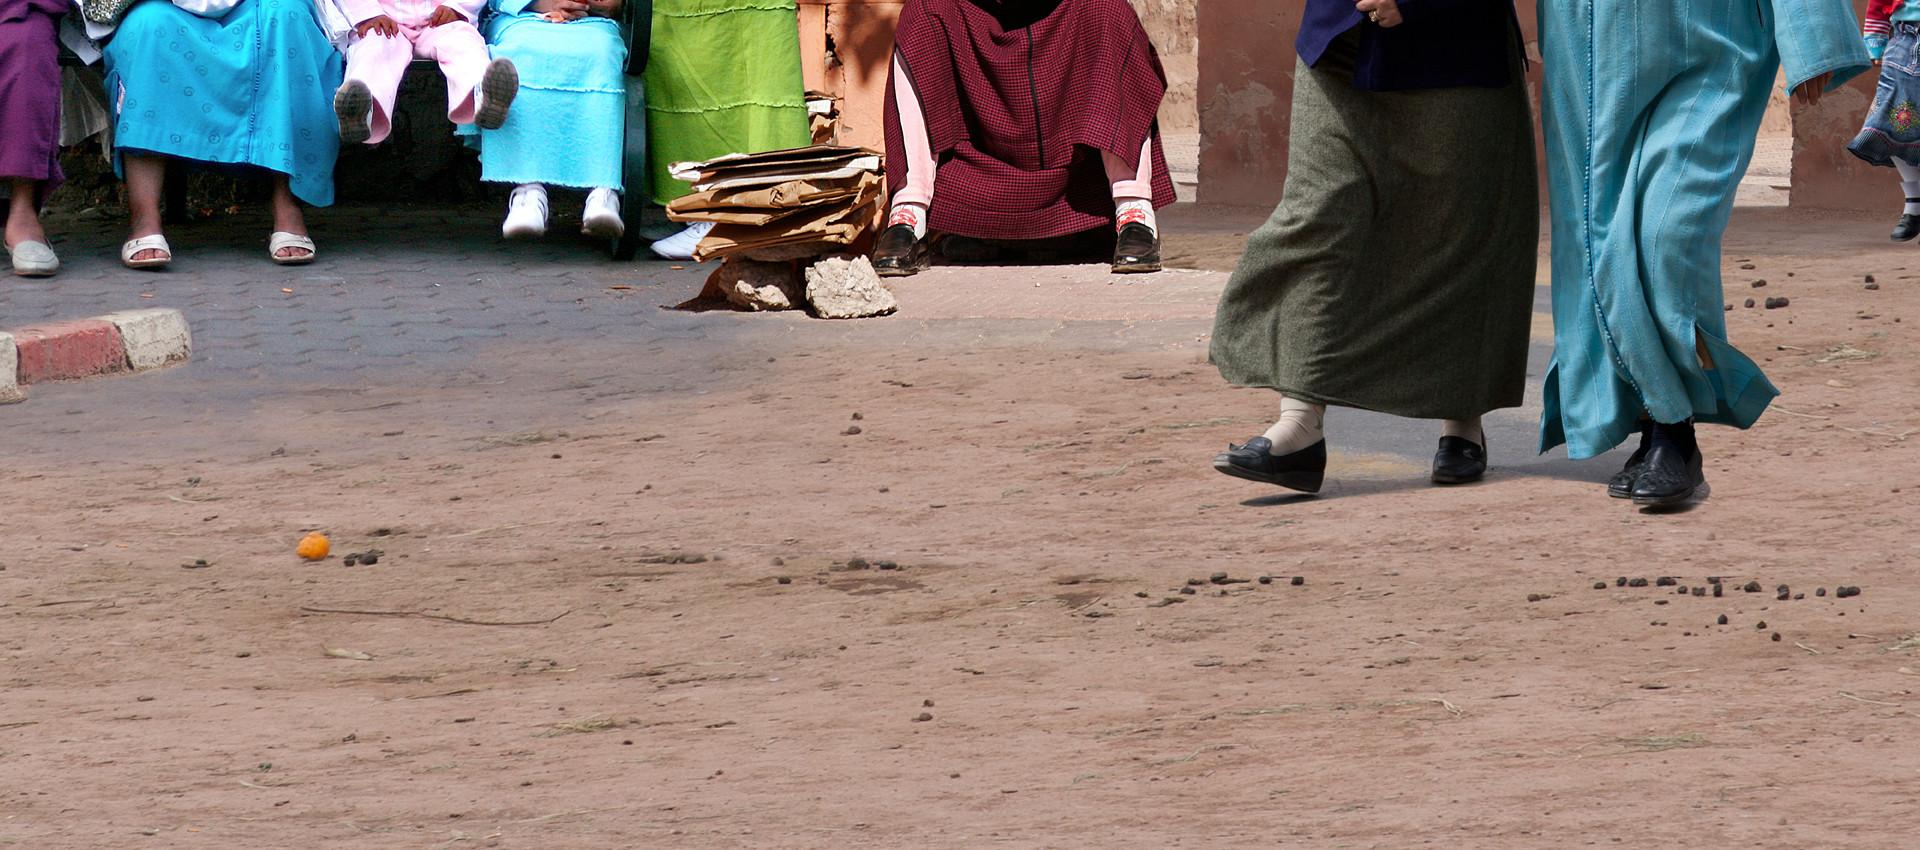 marocshoes1.jpg